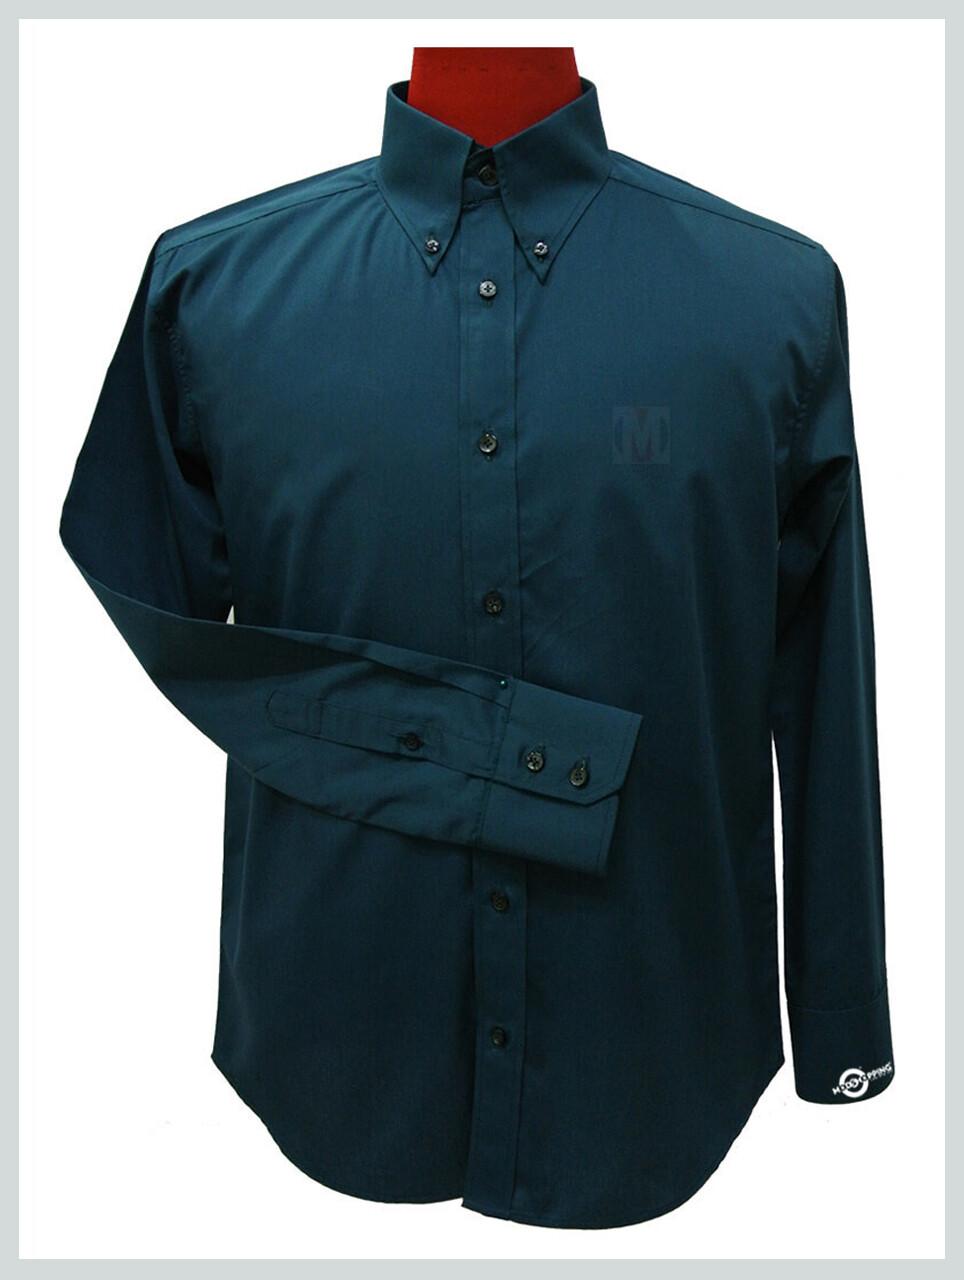 Button Down Shirt| Green Colour Button Down Shirt For Men